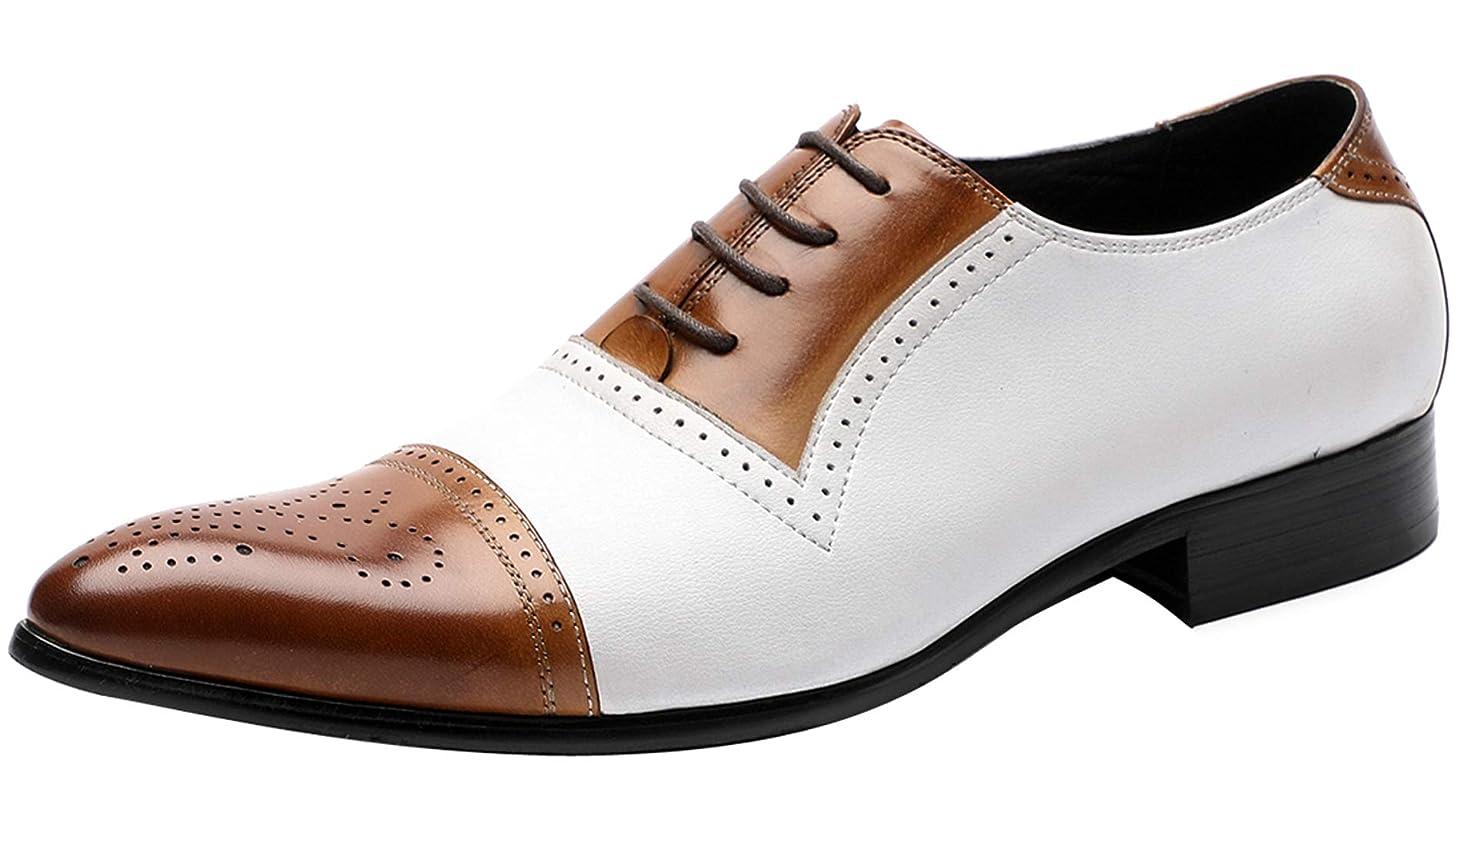 Oxford Shoes for Men Formal Leather Lace Up Brogue Cap-Toe Mens Dress Shoes Fashion Contrast Color